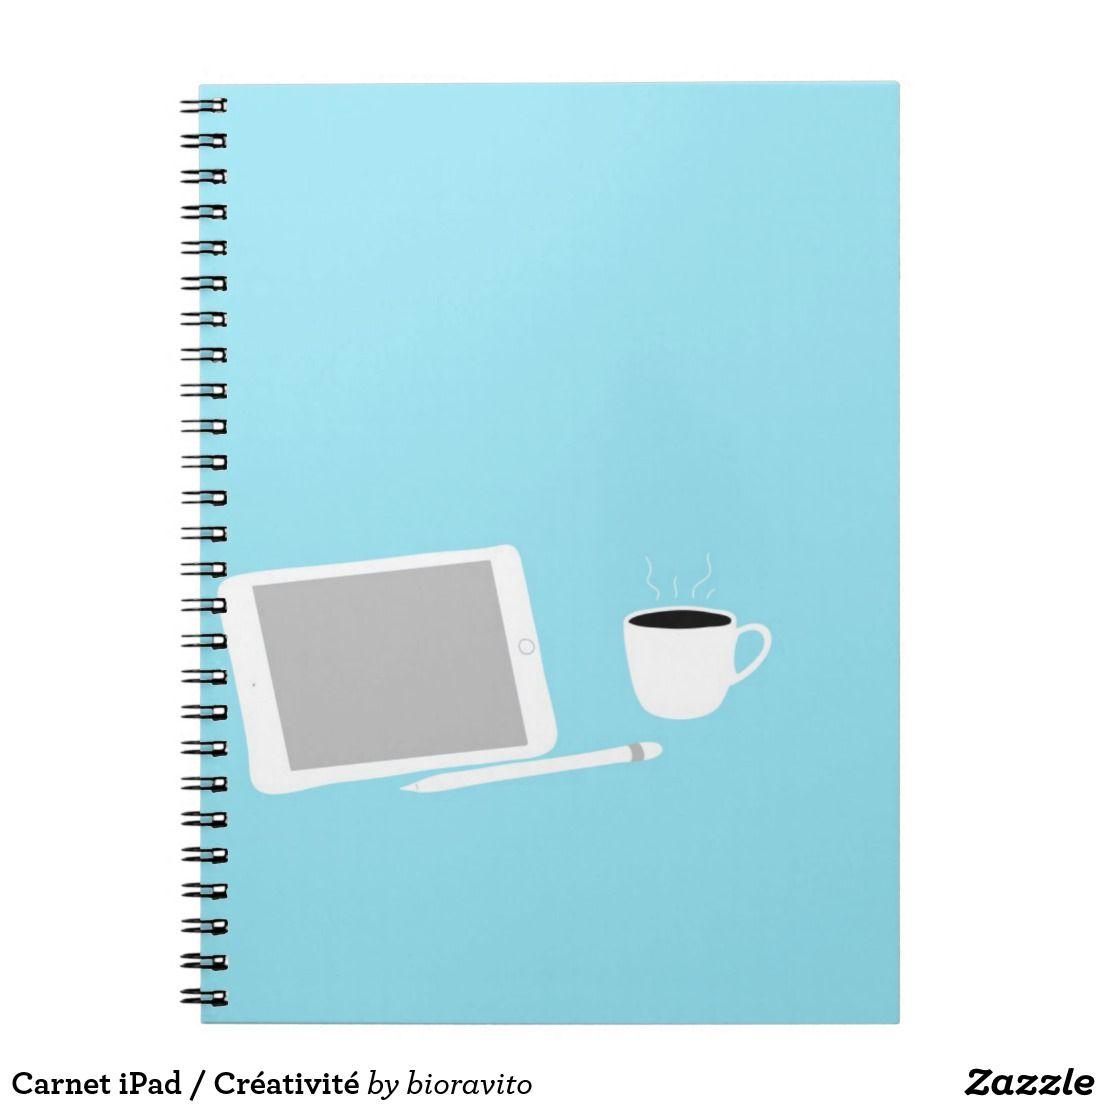 Carnet Ipad Creativite Carnet Carnet Personnalise Carte Postale Personnalisee